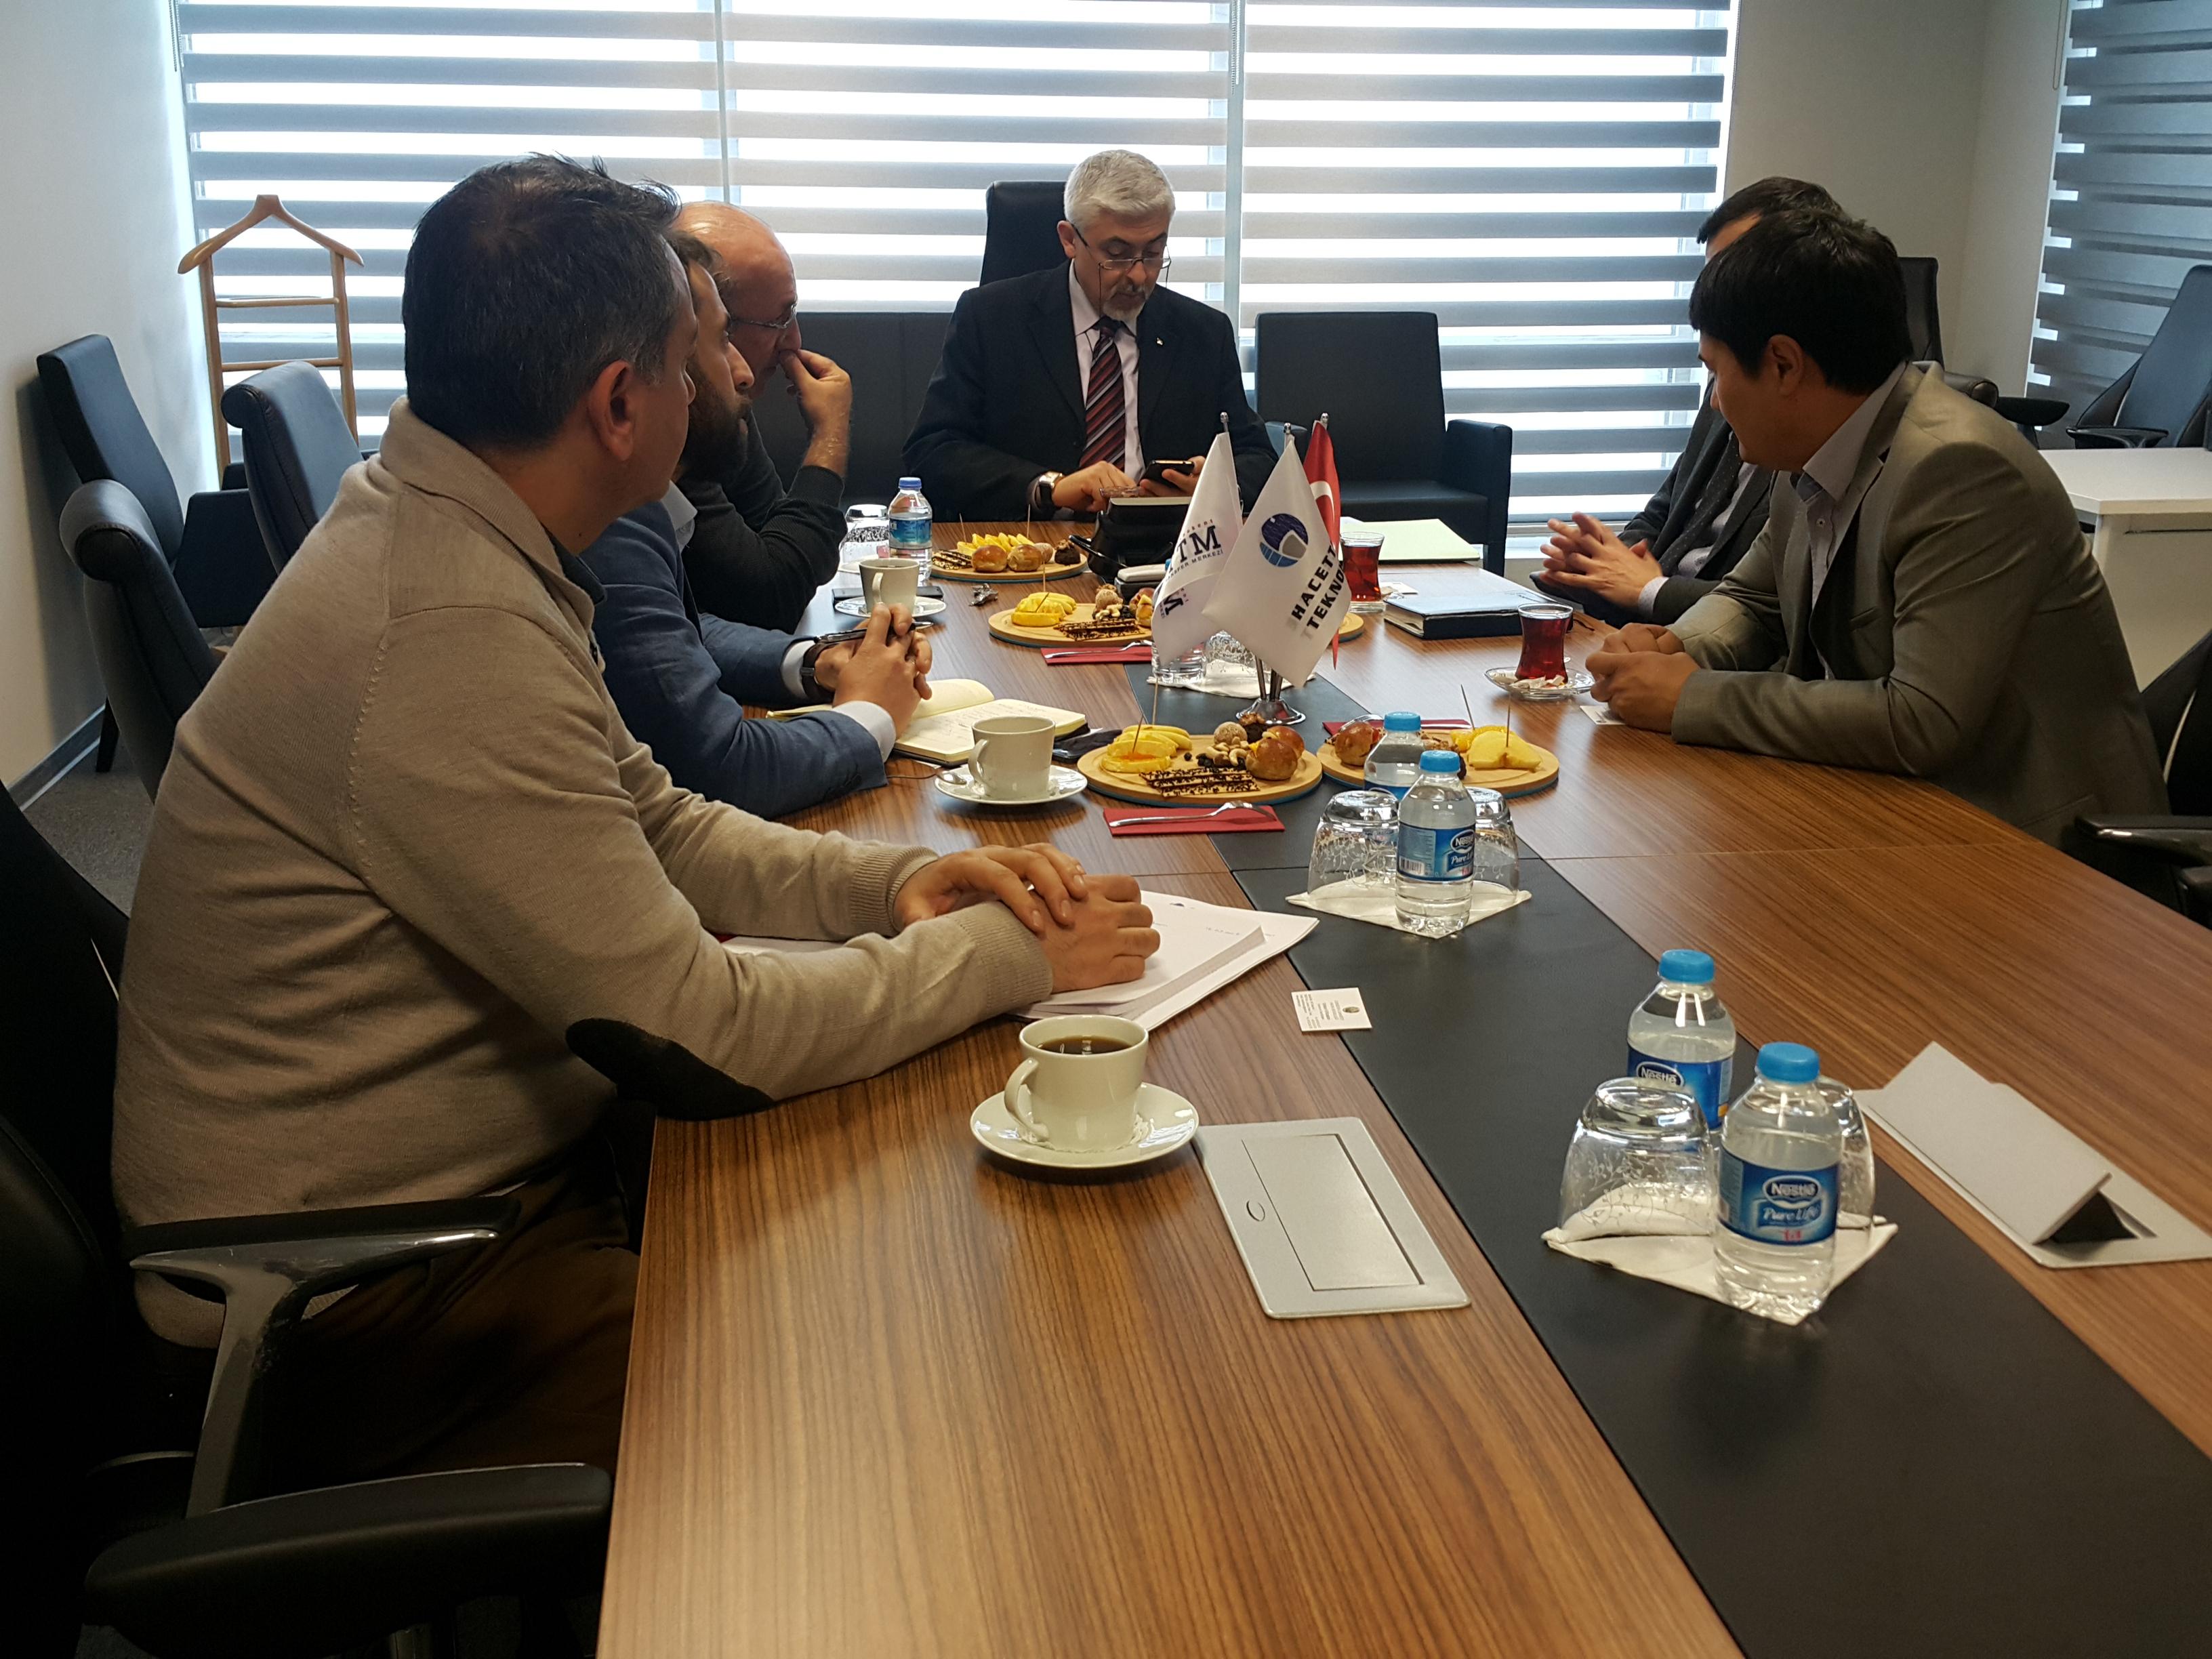 Özbekistan Ticaret  Ataşeliği  Hacettepe Teknokent